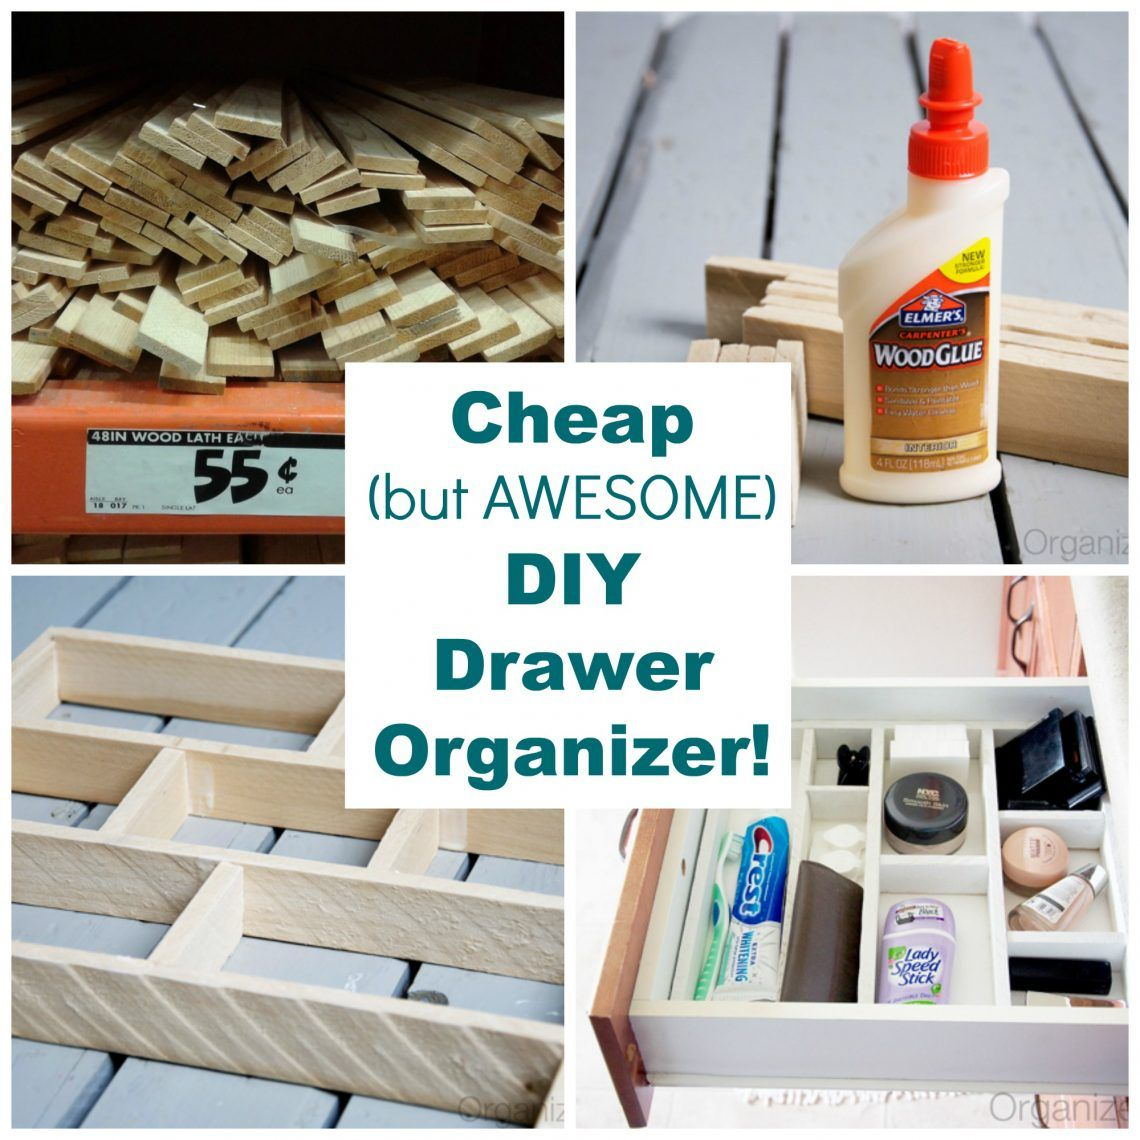 Organisateur Placard Cuisine: Easy And Affordable- DIY DRAWER ORGANIZER